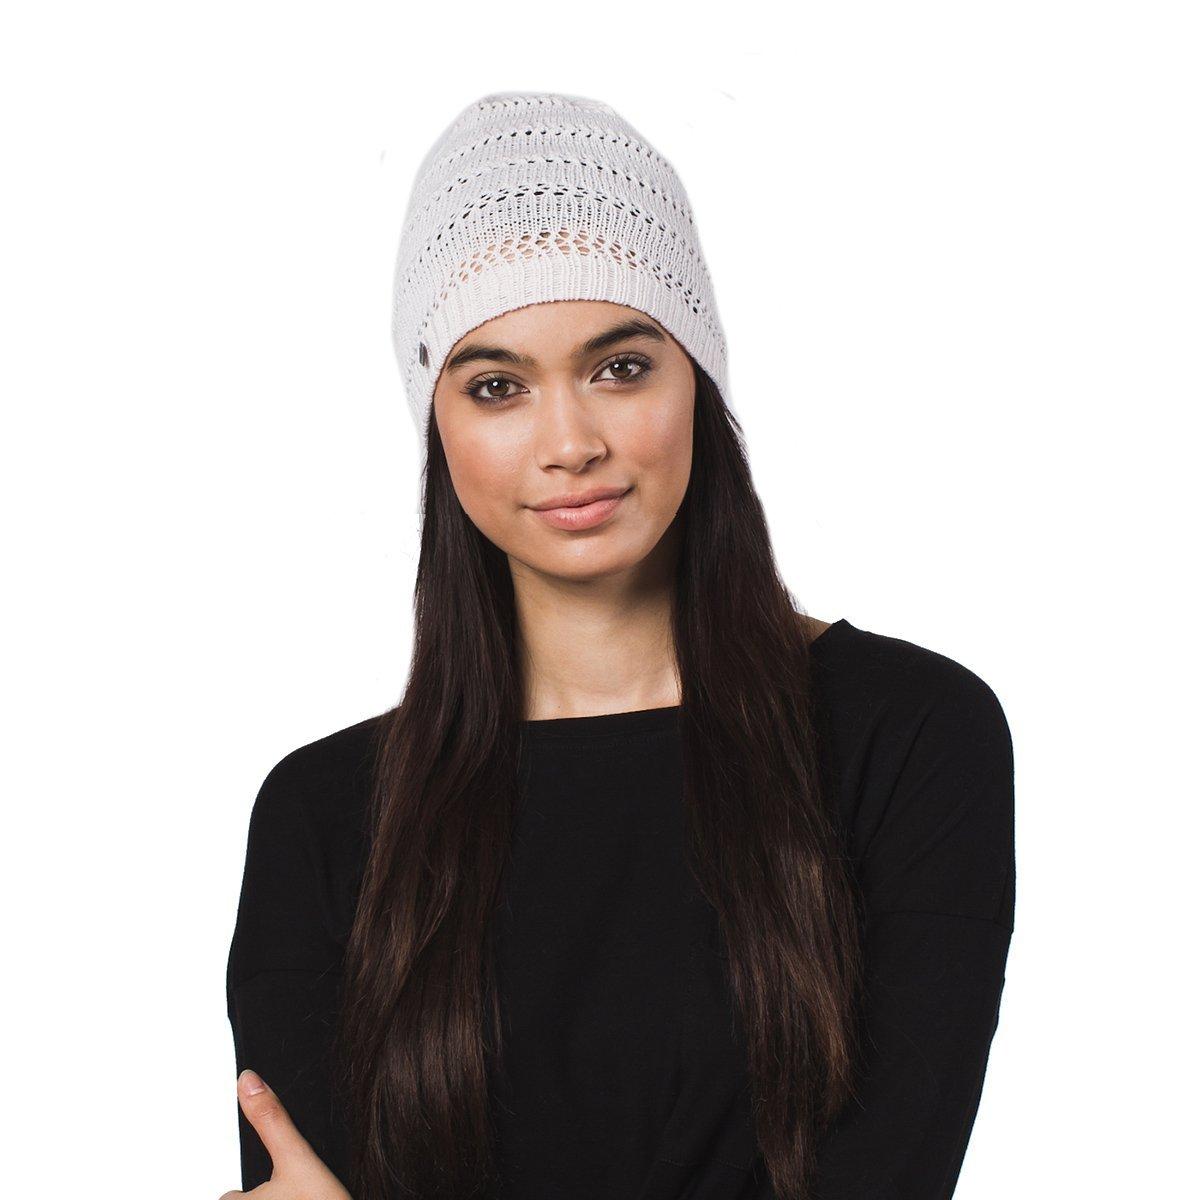 206a6f3d9cf Krochet Kids Fair Trade Ali Pale Pink Beanie Hat at Amazon Women s Clothing  store